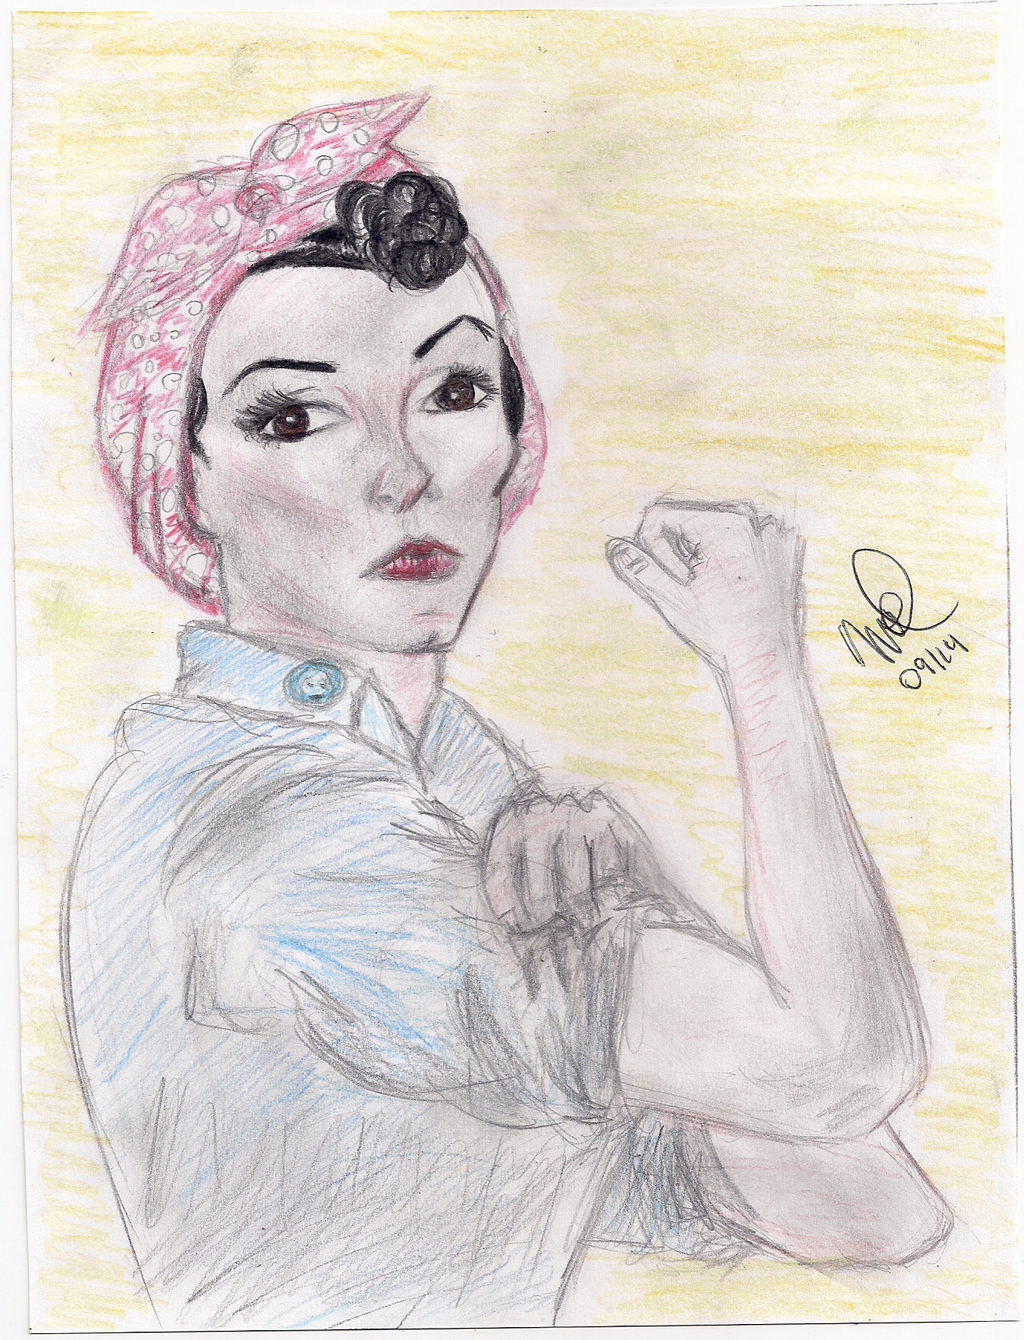 Rosie the Riveter sketch by BelenMrsC